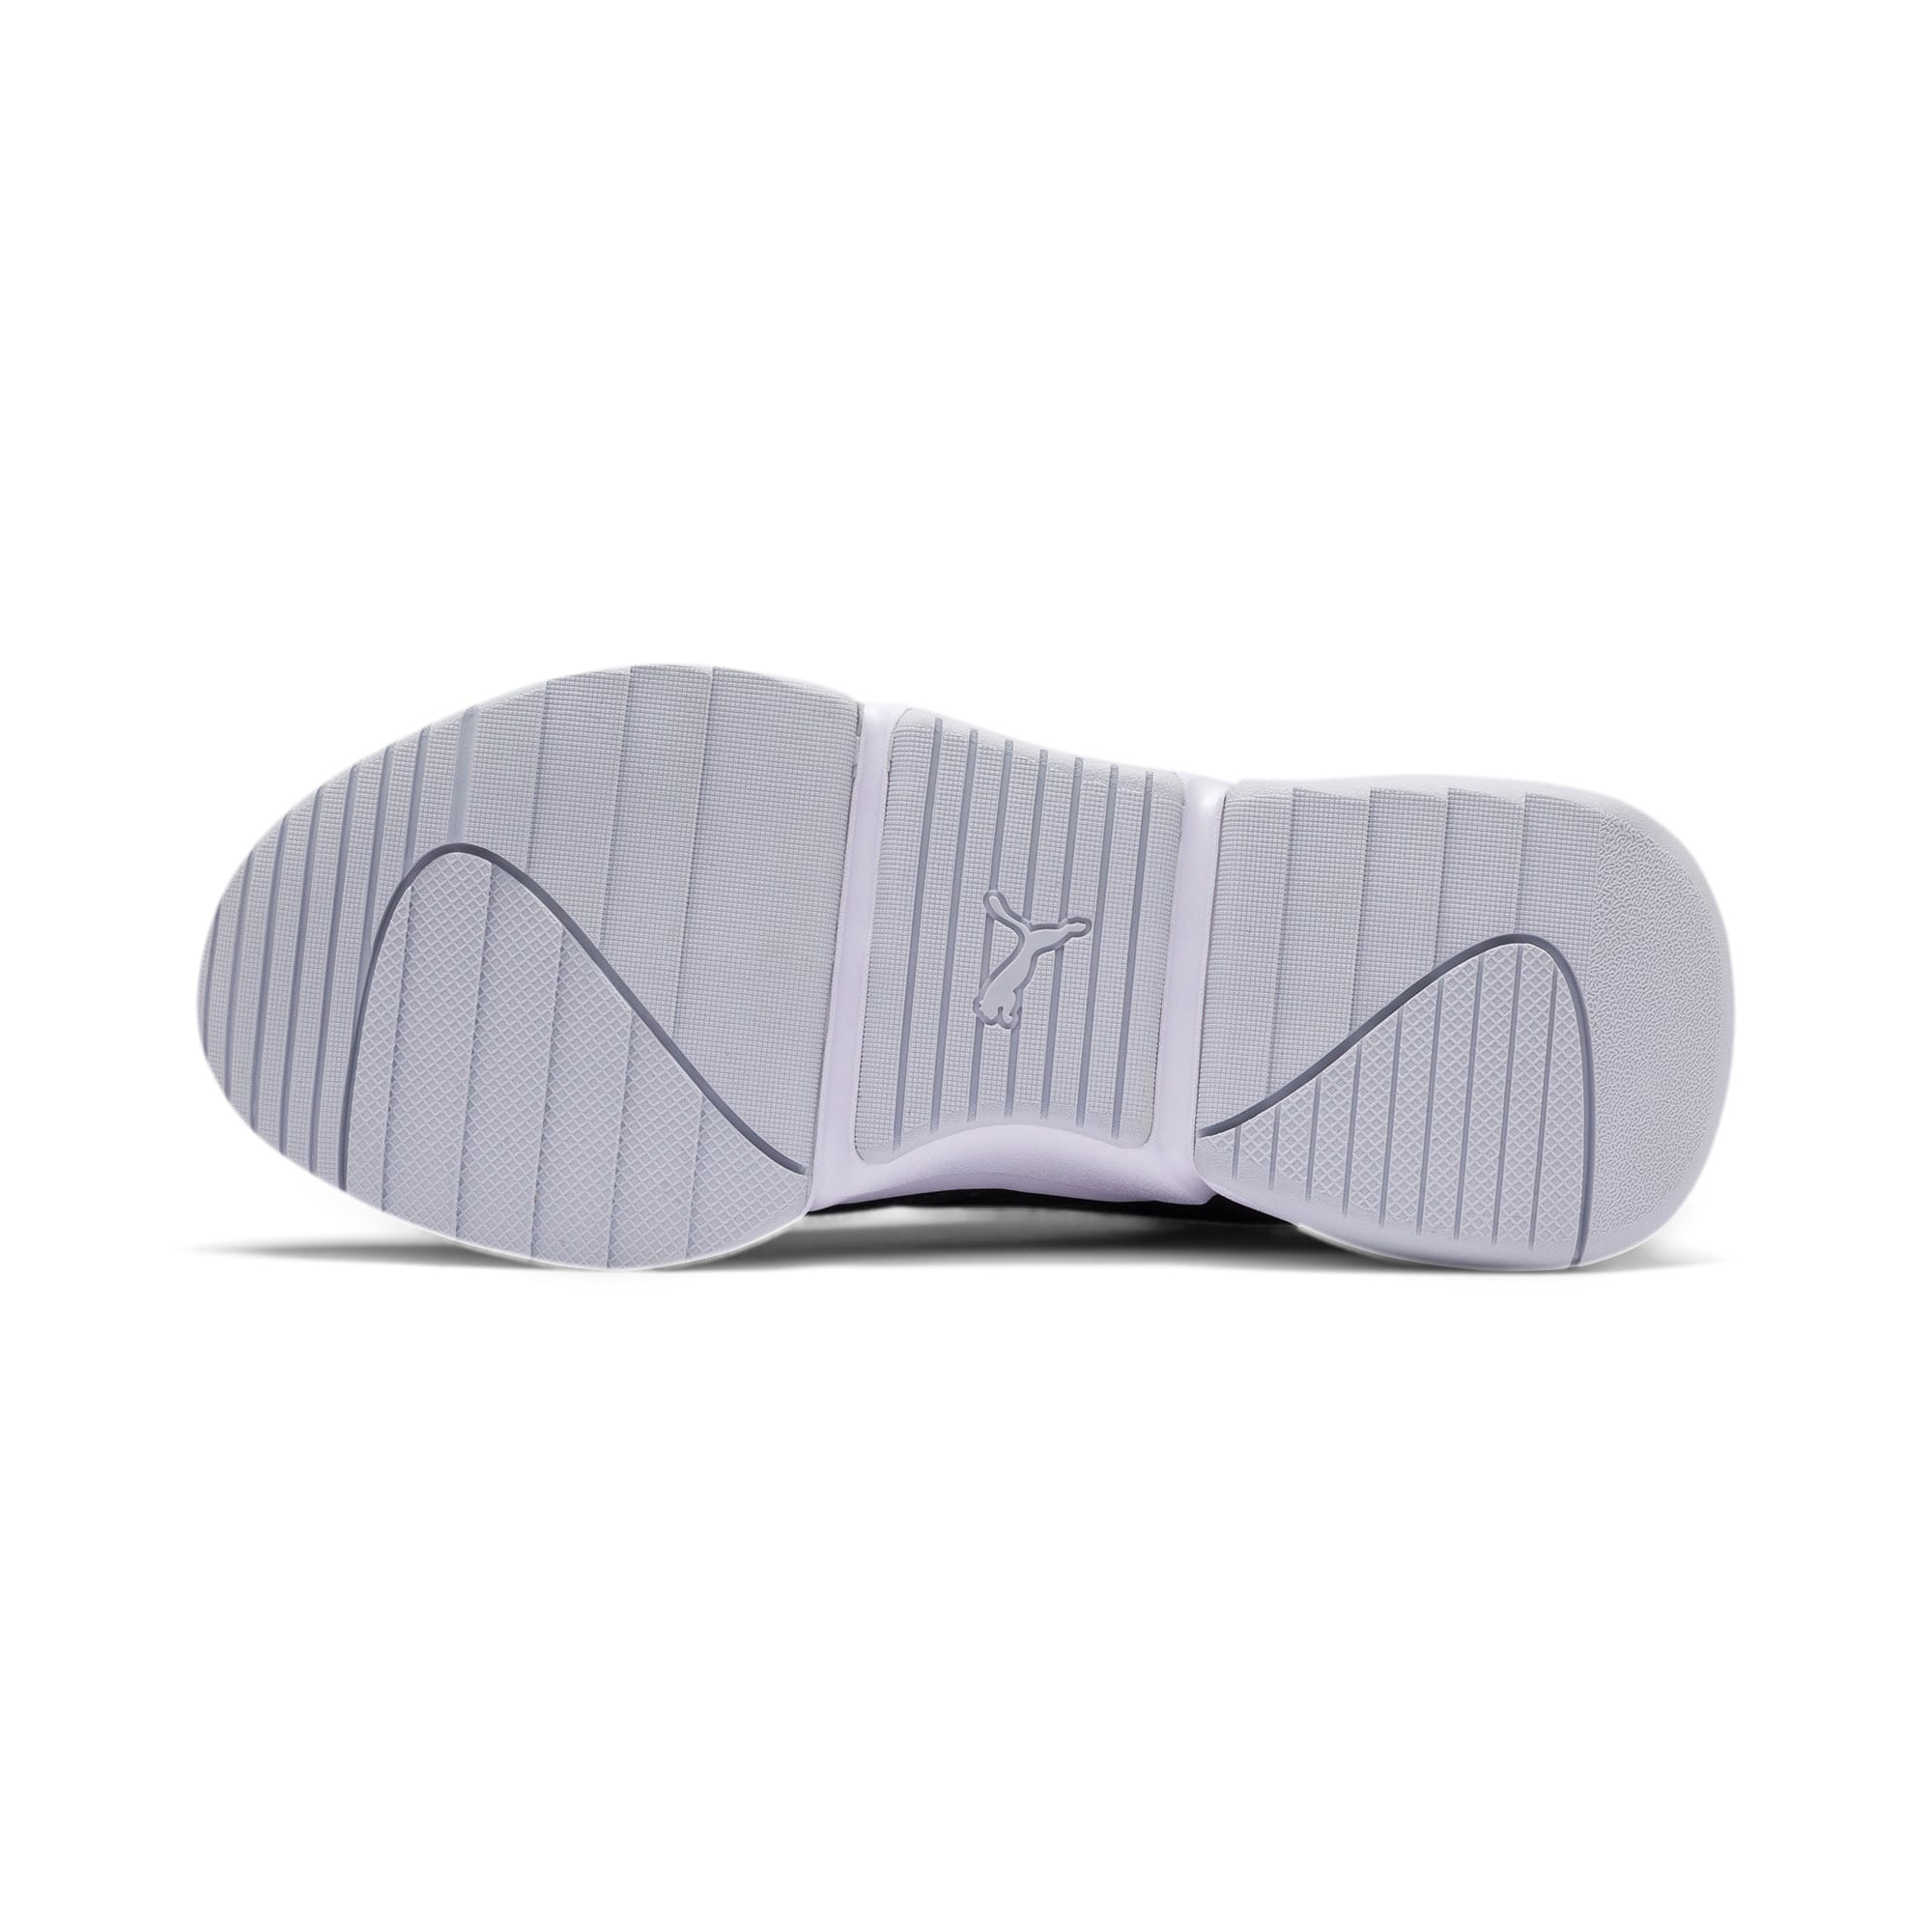 Thumbnail 5 of Nova 2 Women's Sneakers, Puma Black-Heather, medium